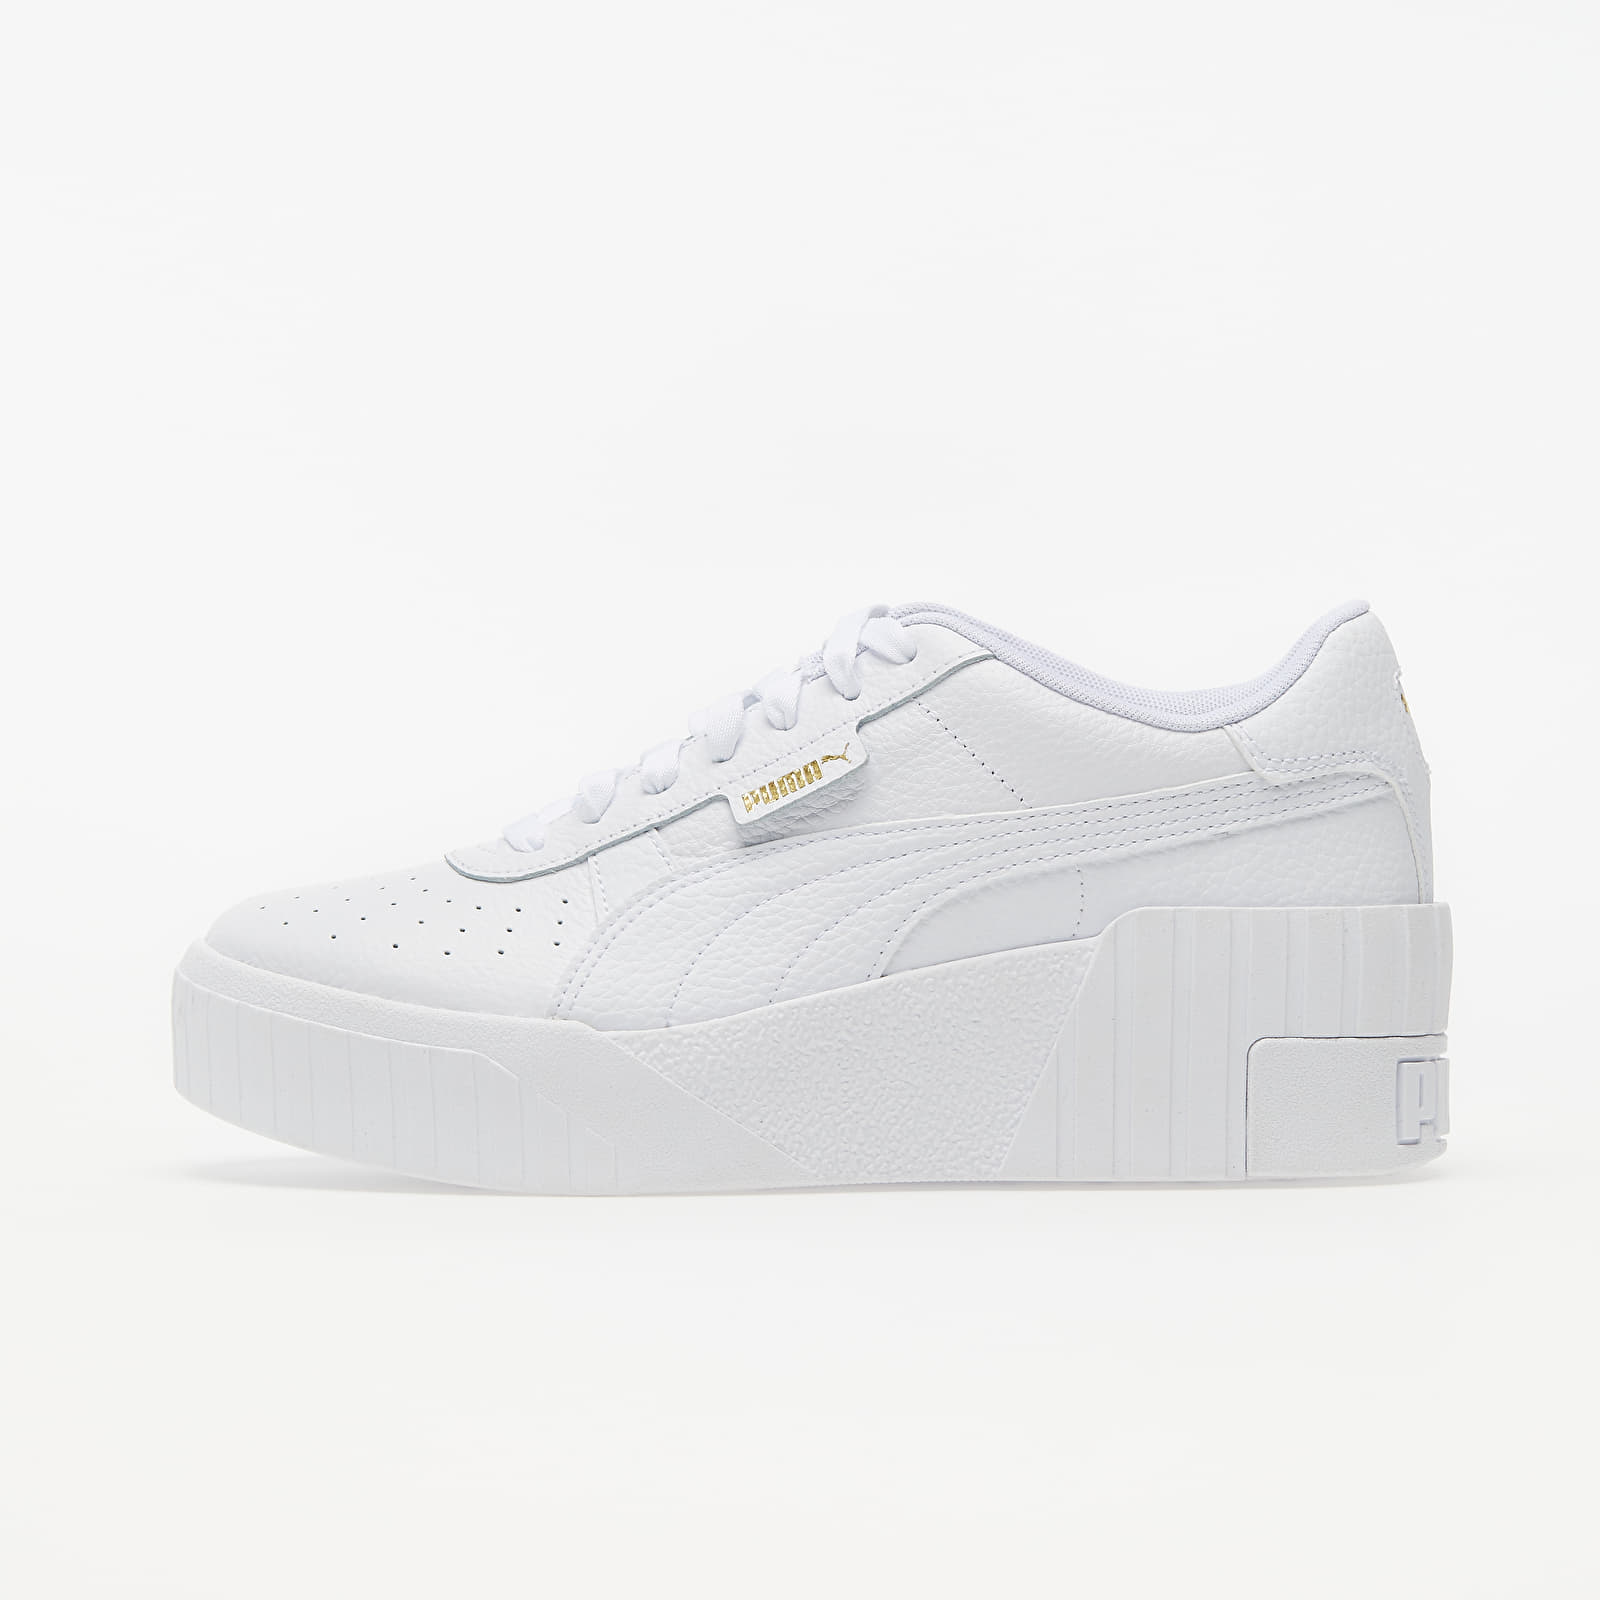 "Frauen Puma Cali Wedge Wn""s Puma White-Puma White"